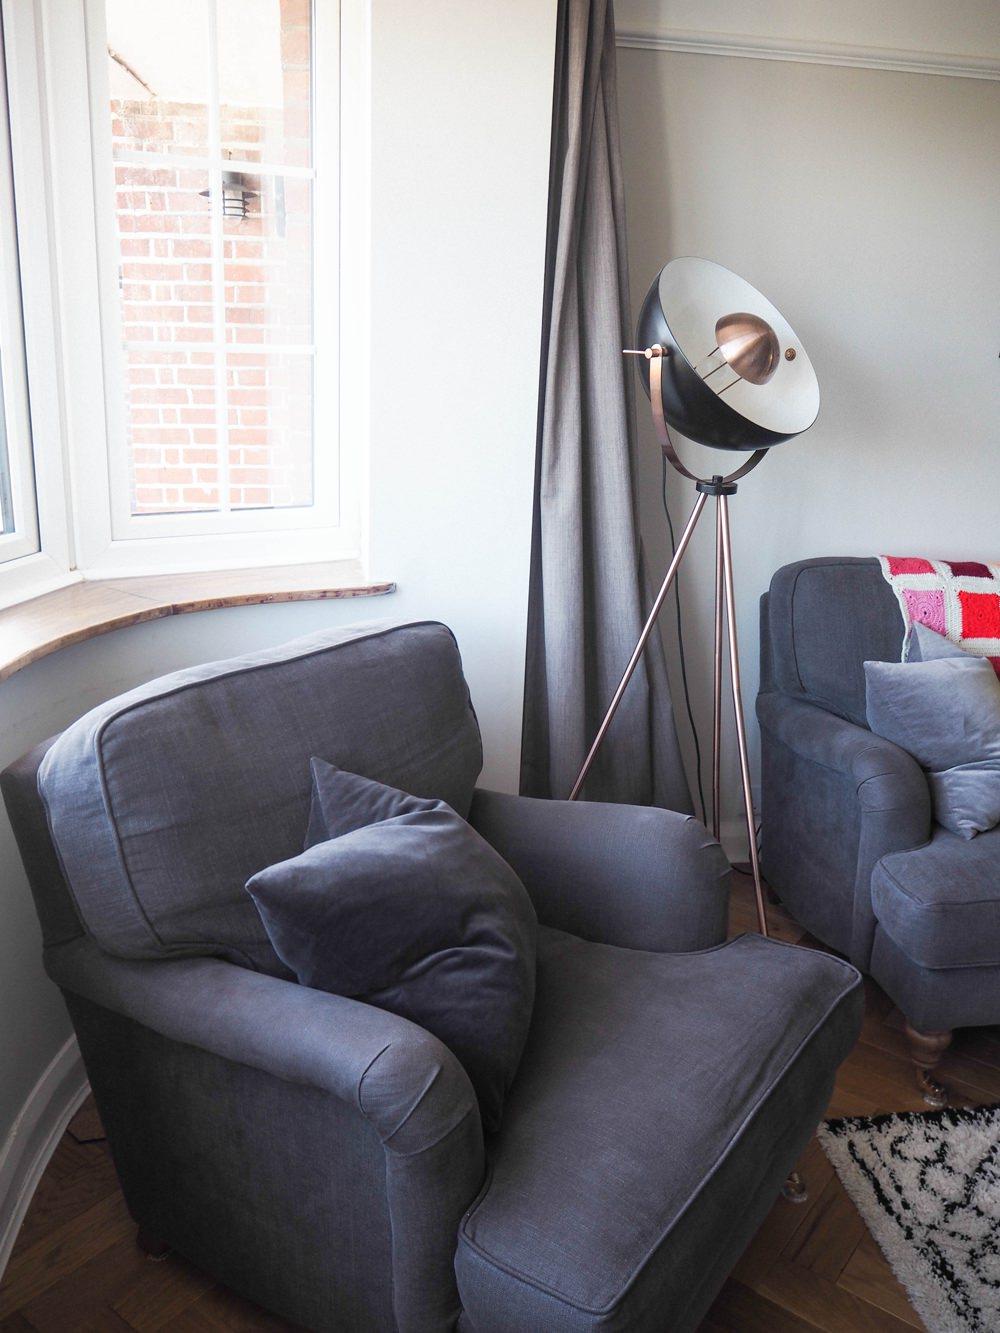 1930s House Living Room Renovation Grey Armchair Bluebell Sofa.com Velvet Cushion Floorlamp Bay Window Curtains